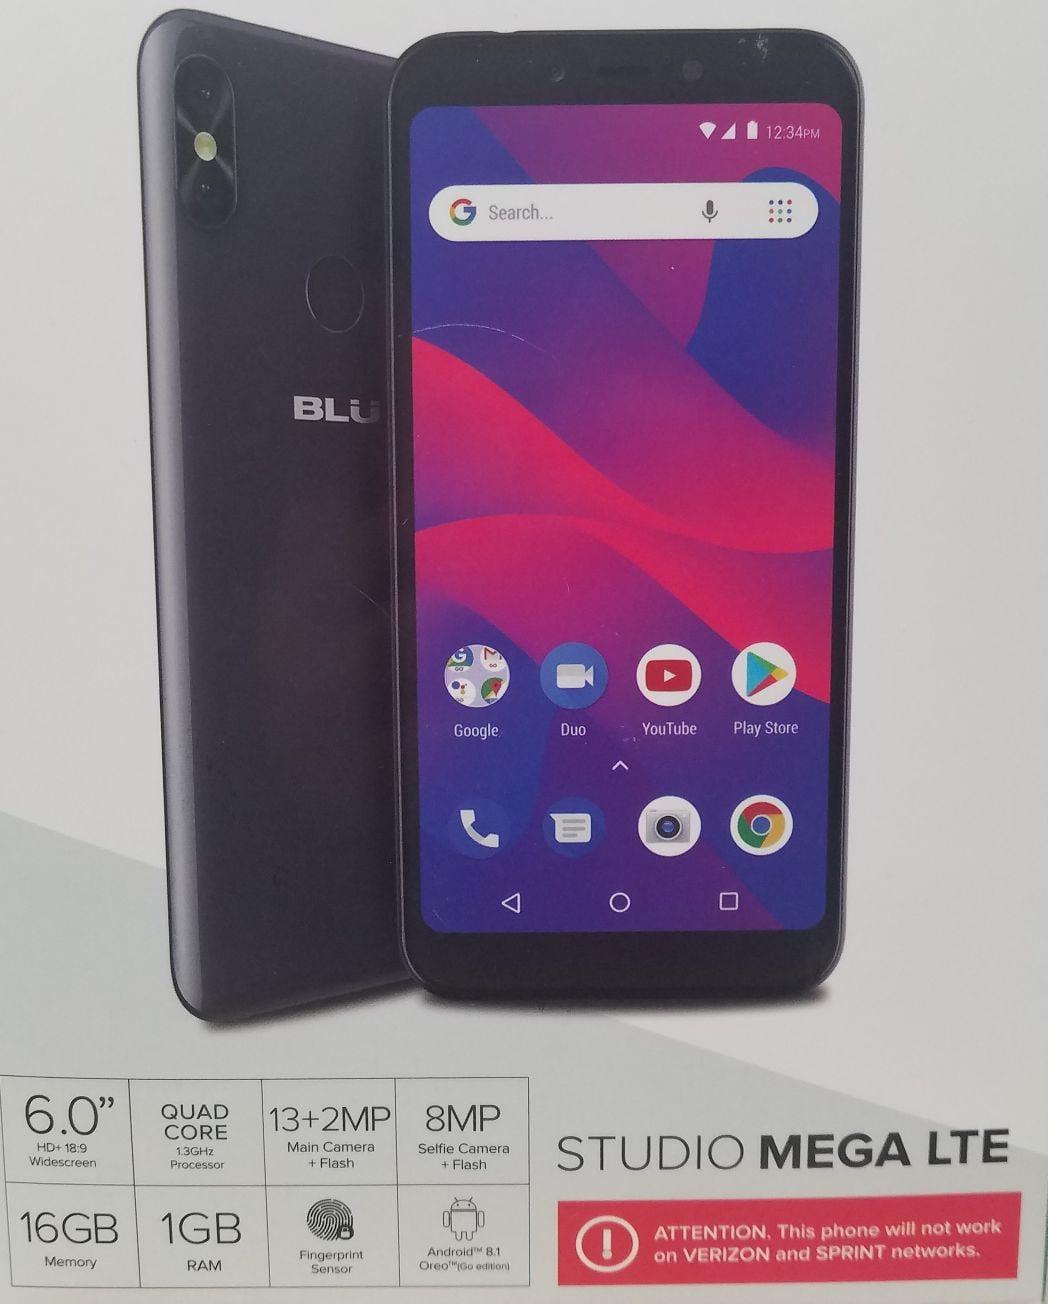 Blu Studio Mega Lte Black